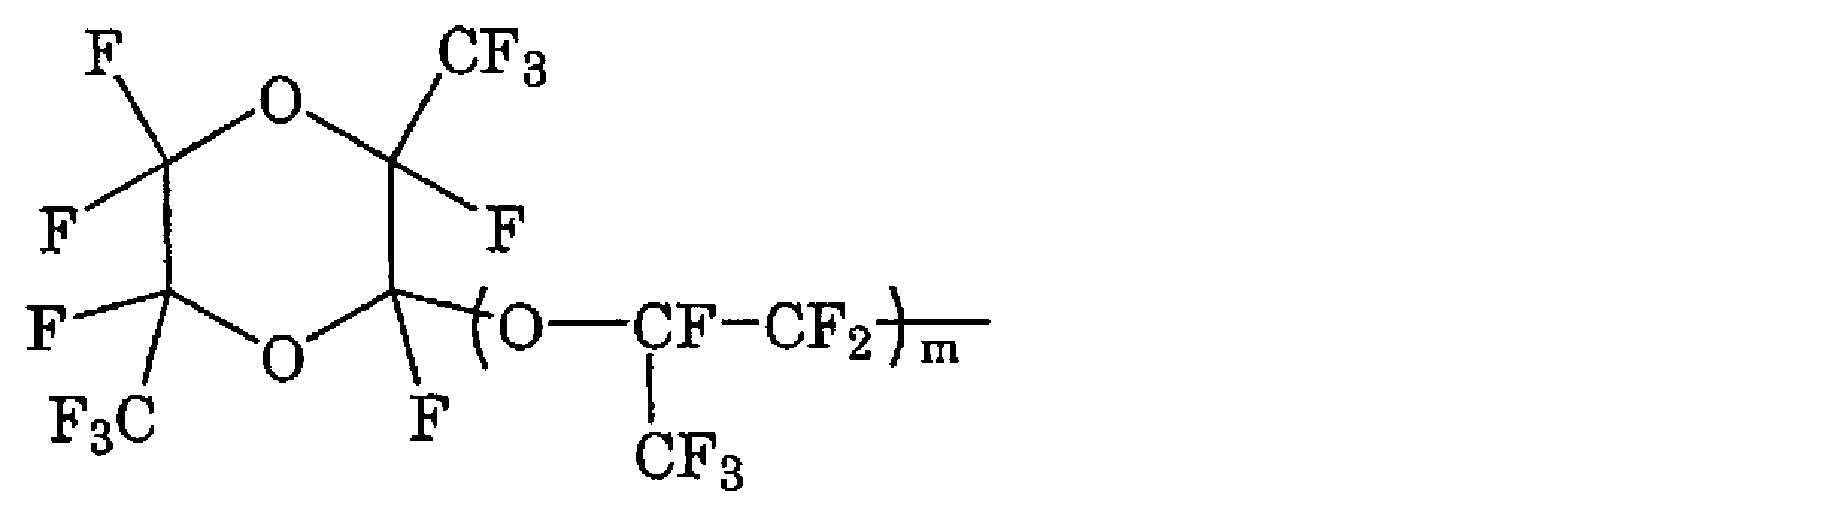 Patent Wo2012086710a1 Polytetrafluoroethylene Mixture